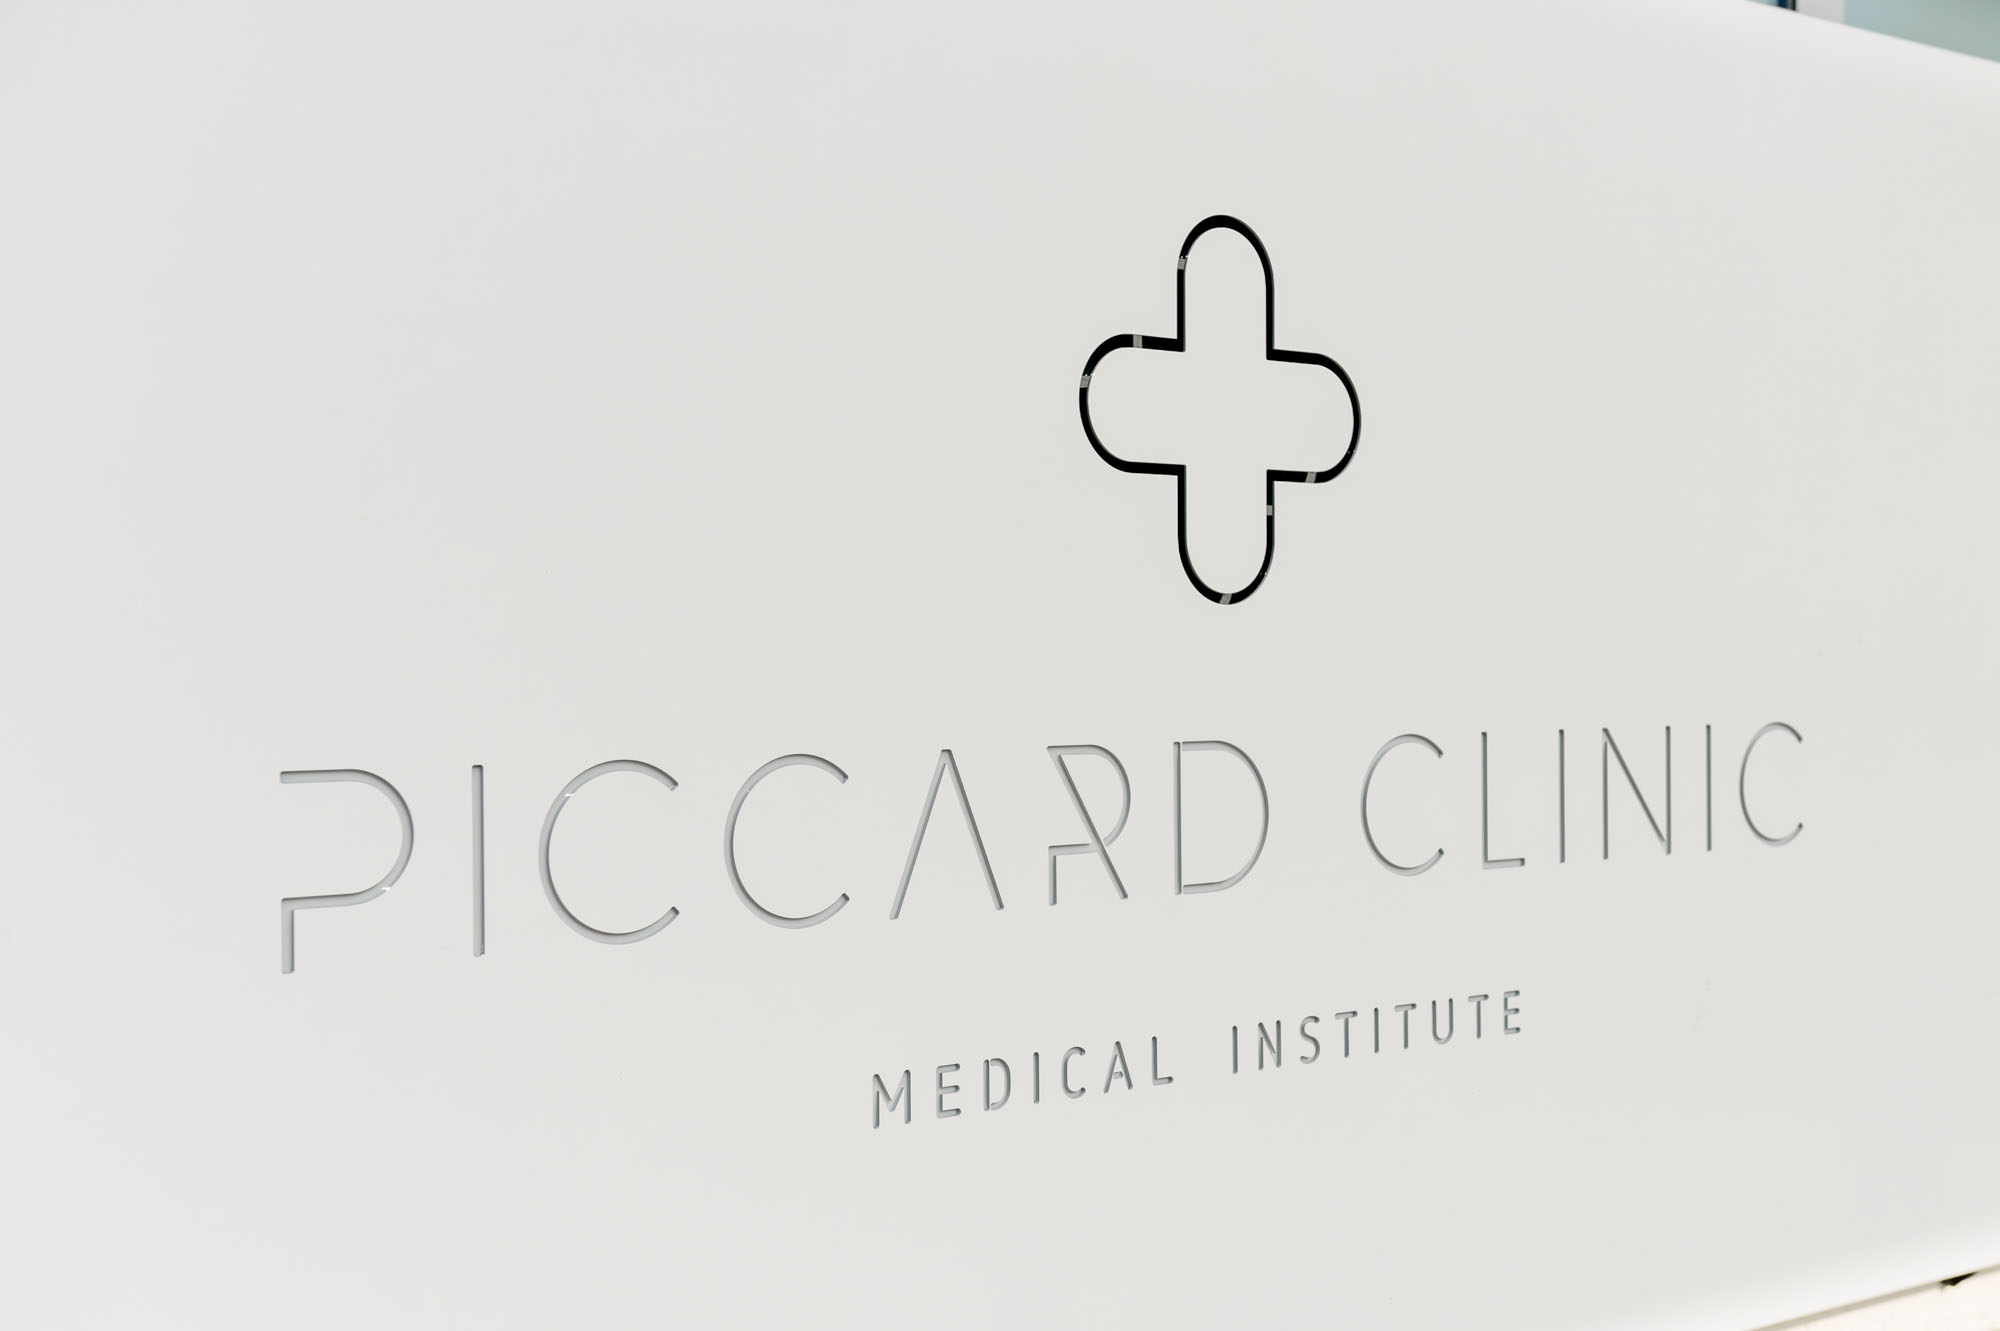 2014-03-08 Picard Clinic Ami small jpg-025.jpg